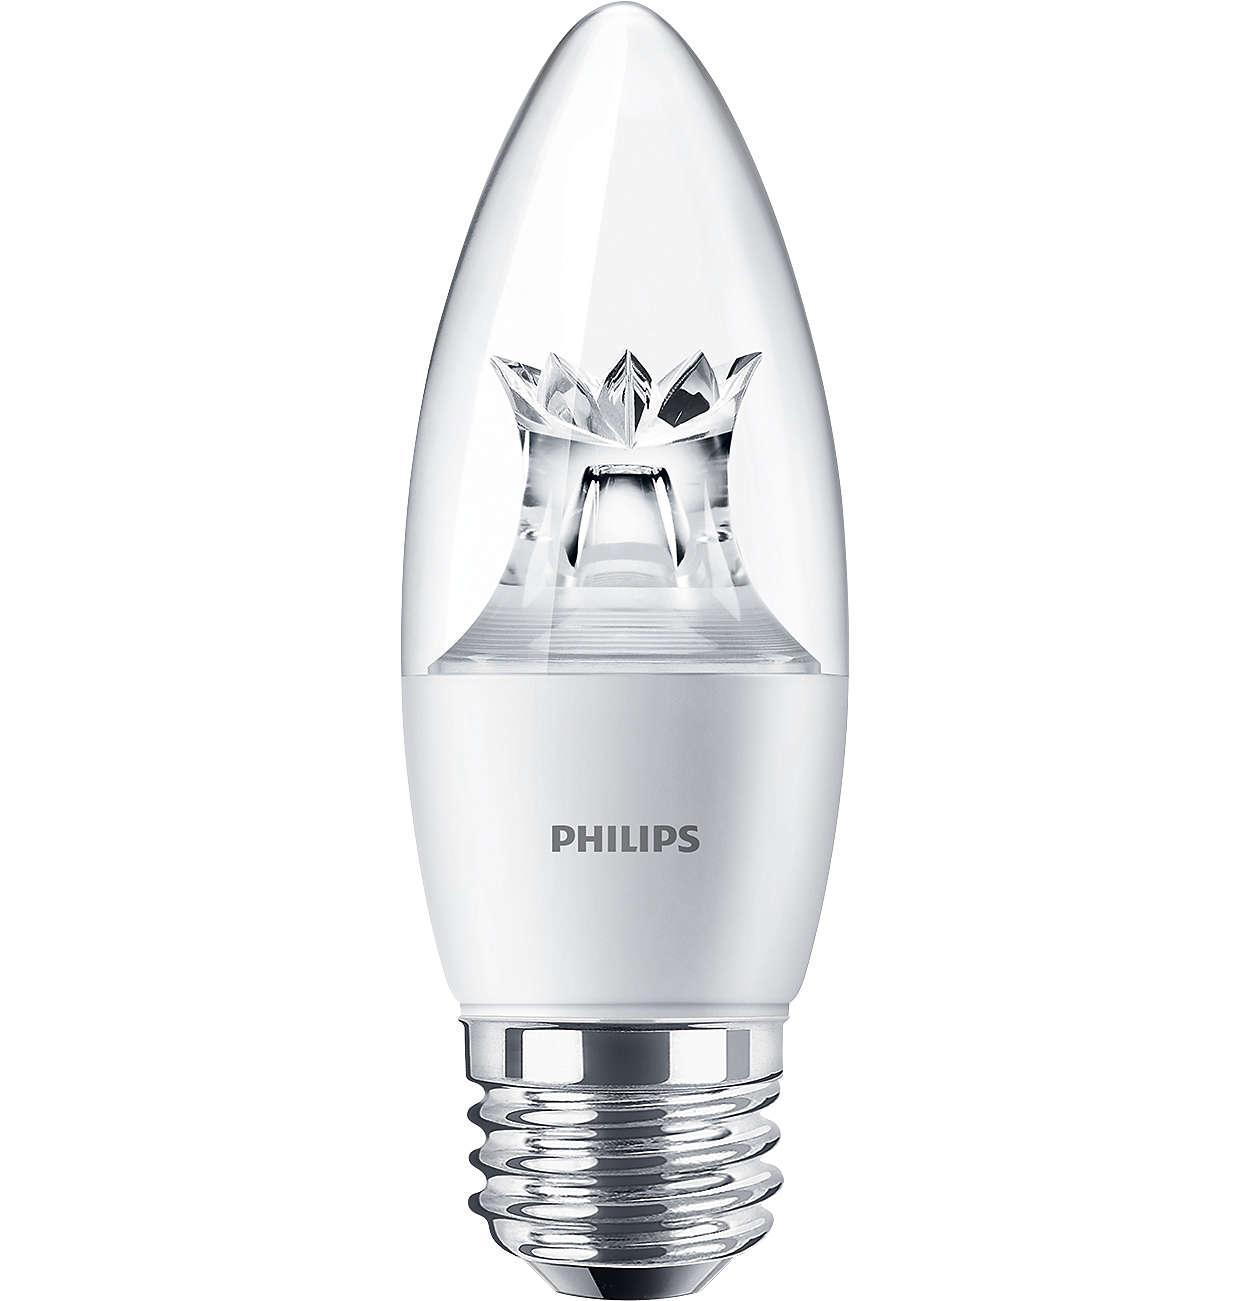 Energy saving elegance with improved lumens and design versatility